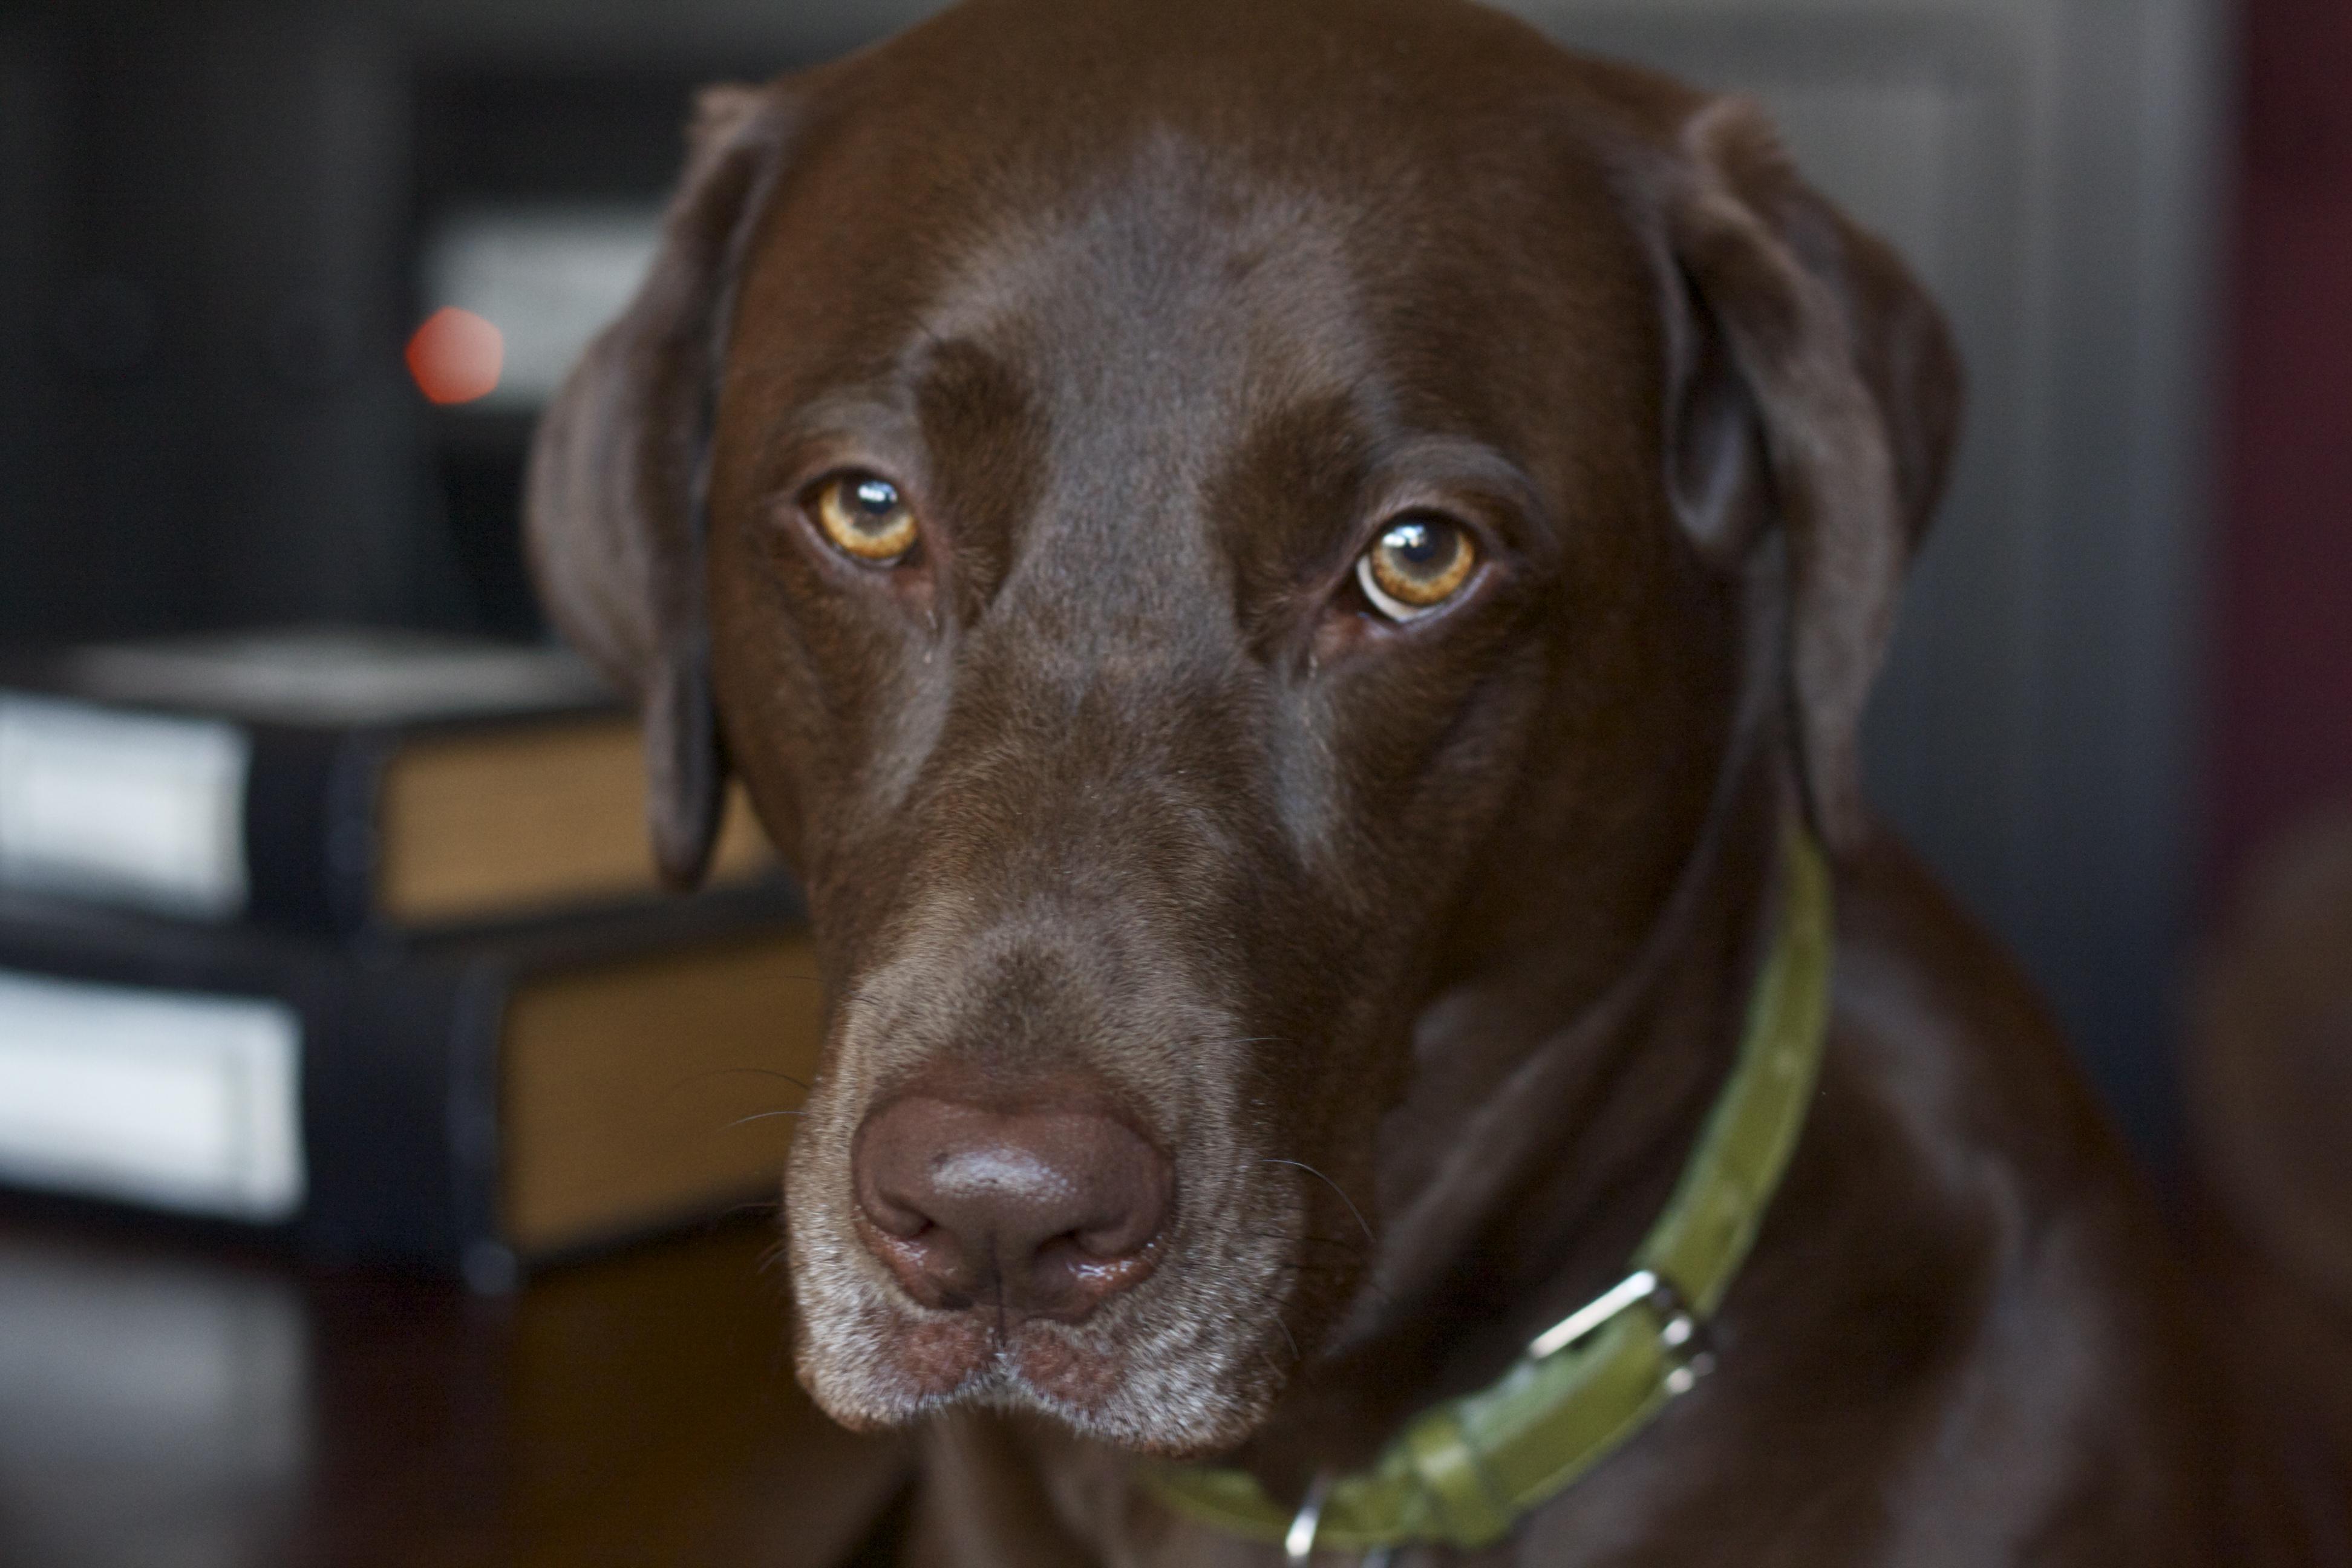 Chocolate Labrador wearing green collar.